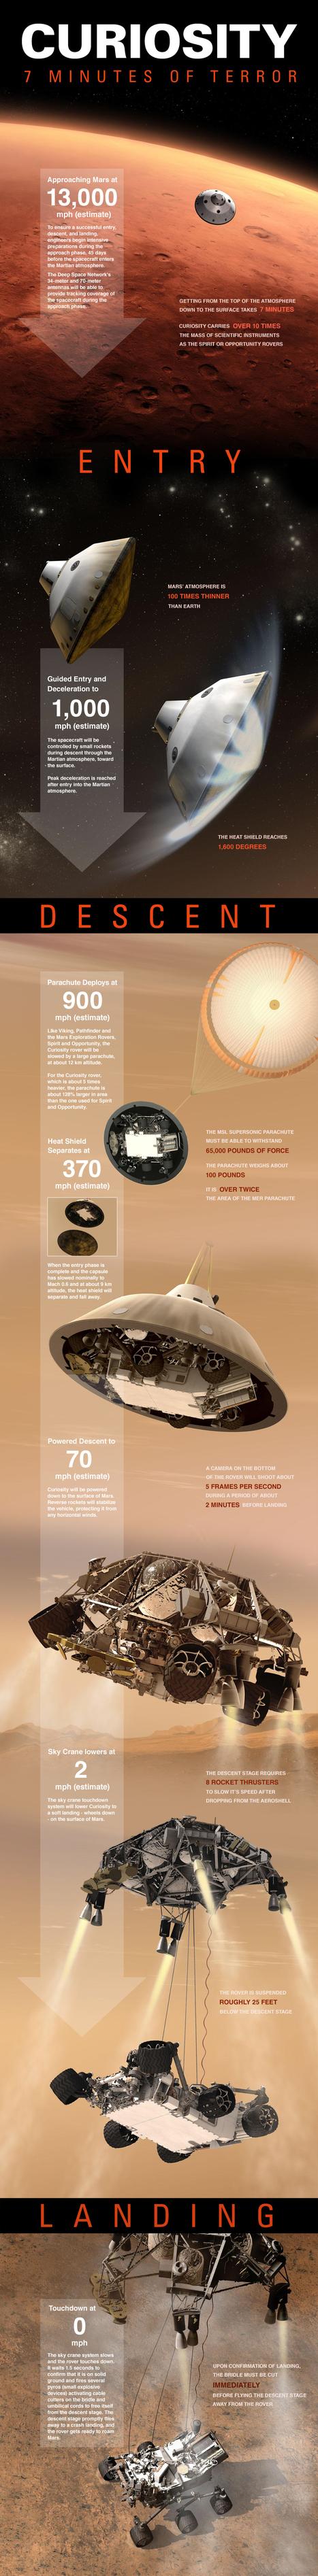 Mars Curiosity - 7 Minutes of Terror - NASA (infographic) | Physics | Scoop.it